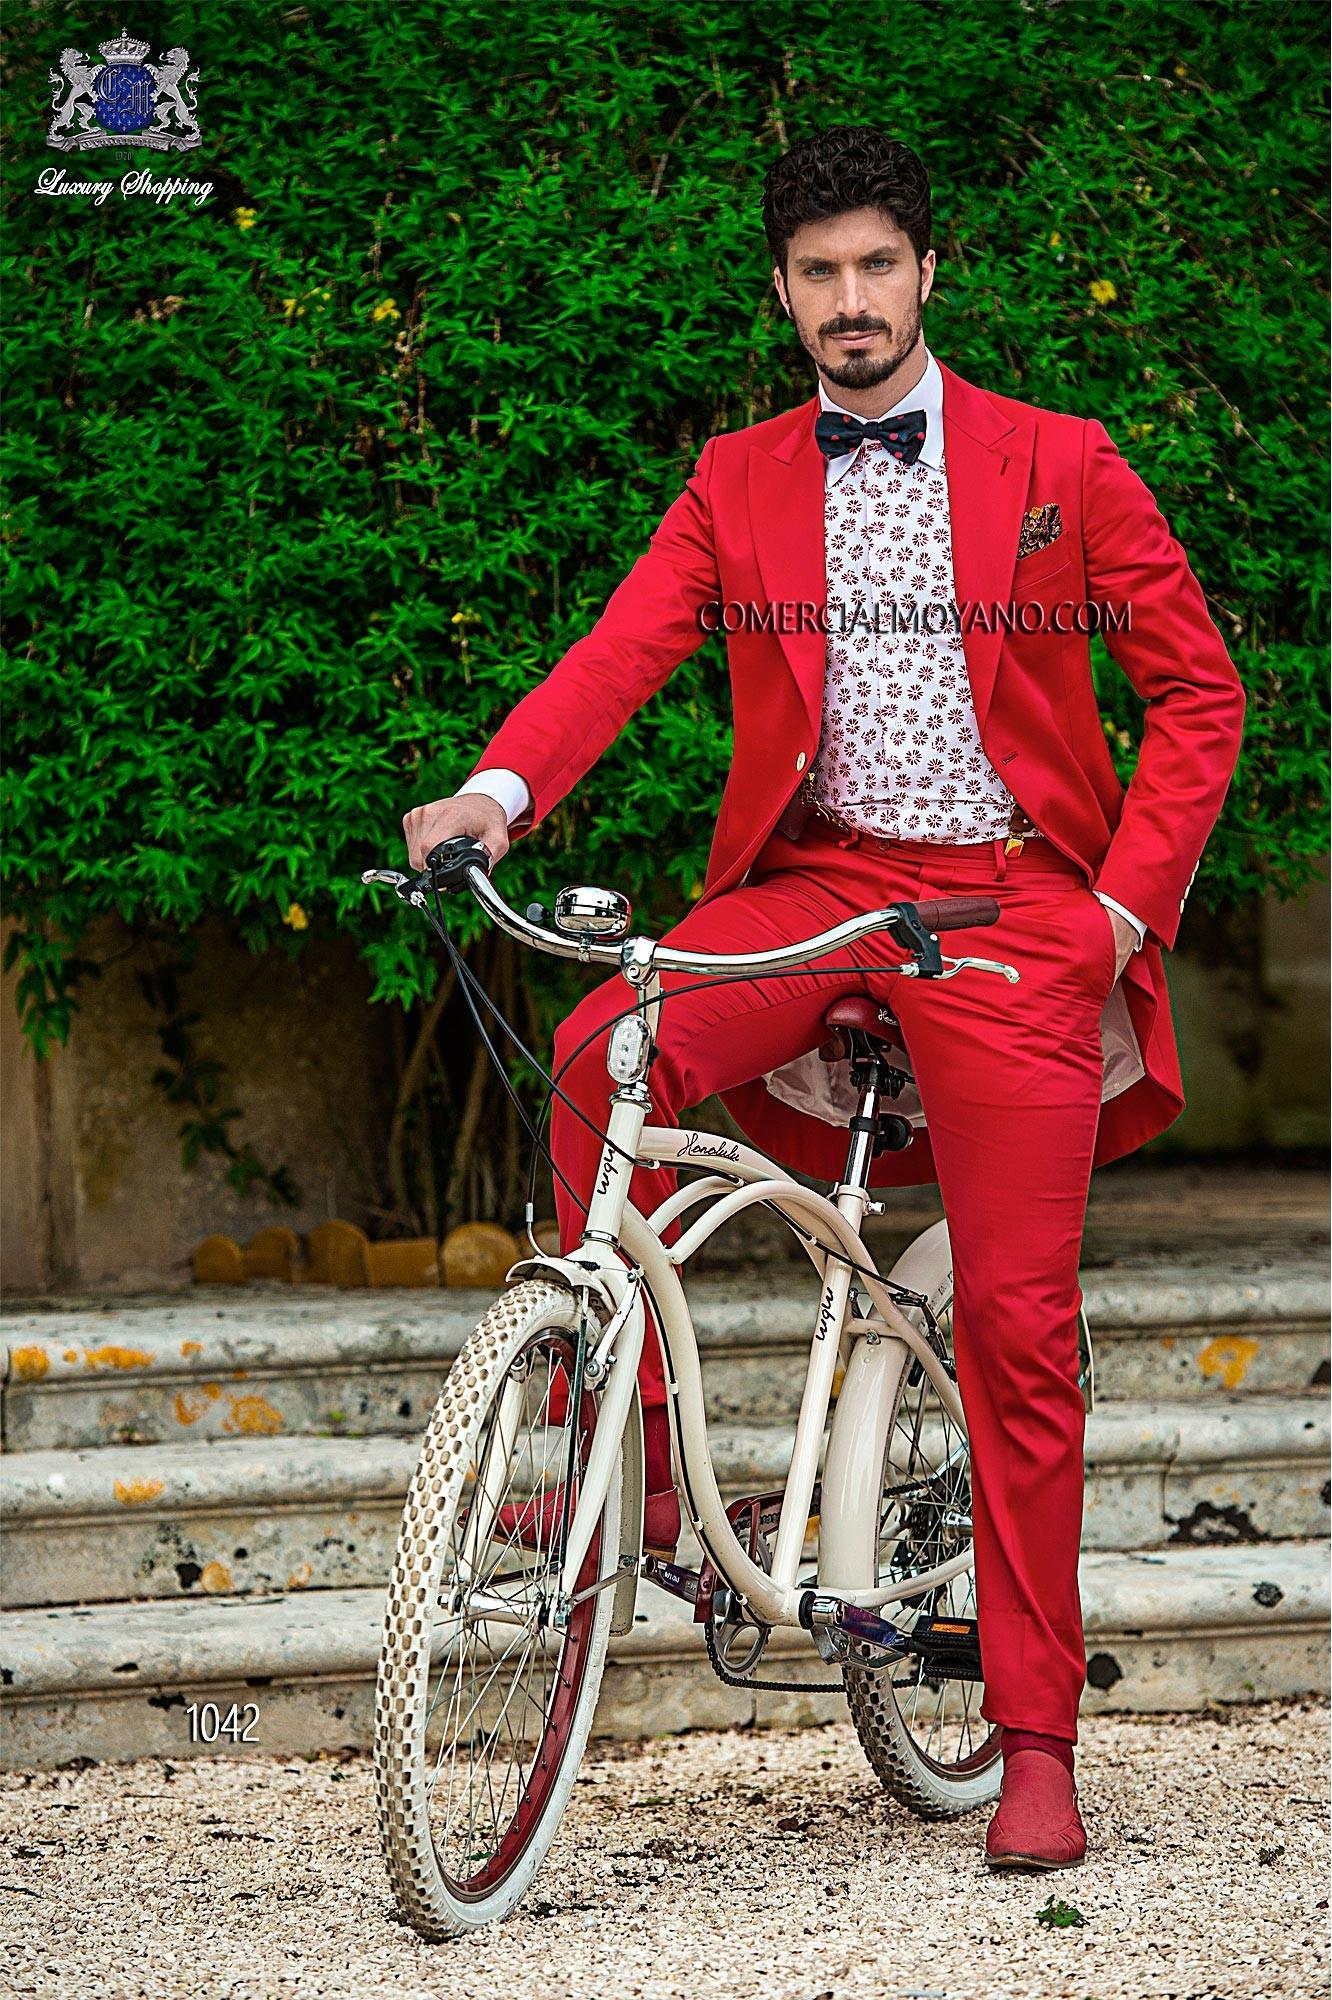 Traje de novio Hipster rojo modelo: 1042 Ottavio Nuccio Gala colección Hipster